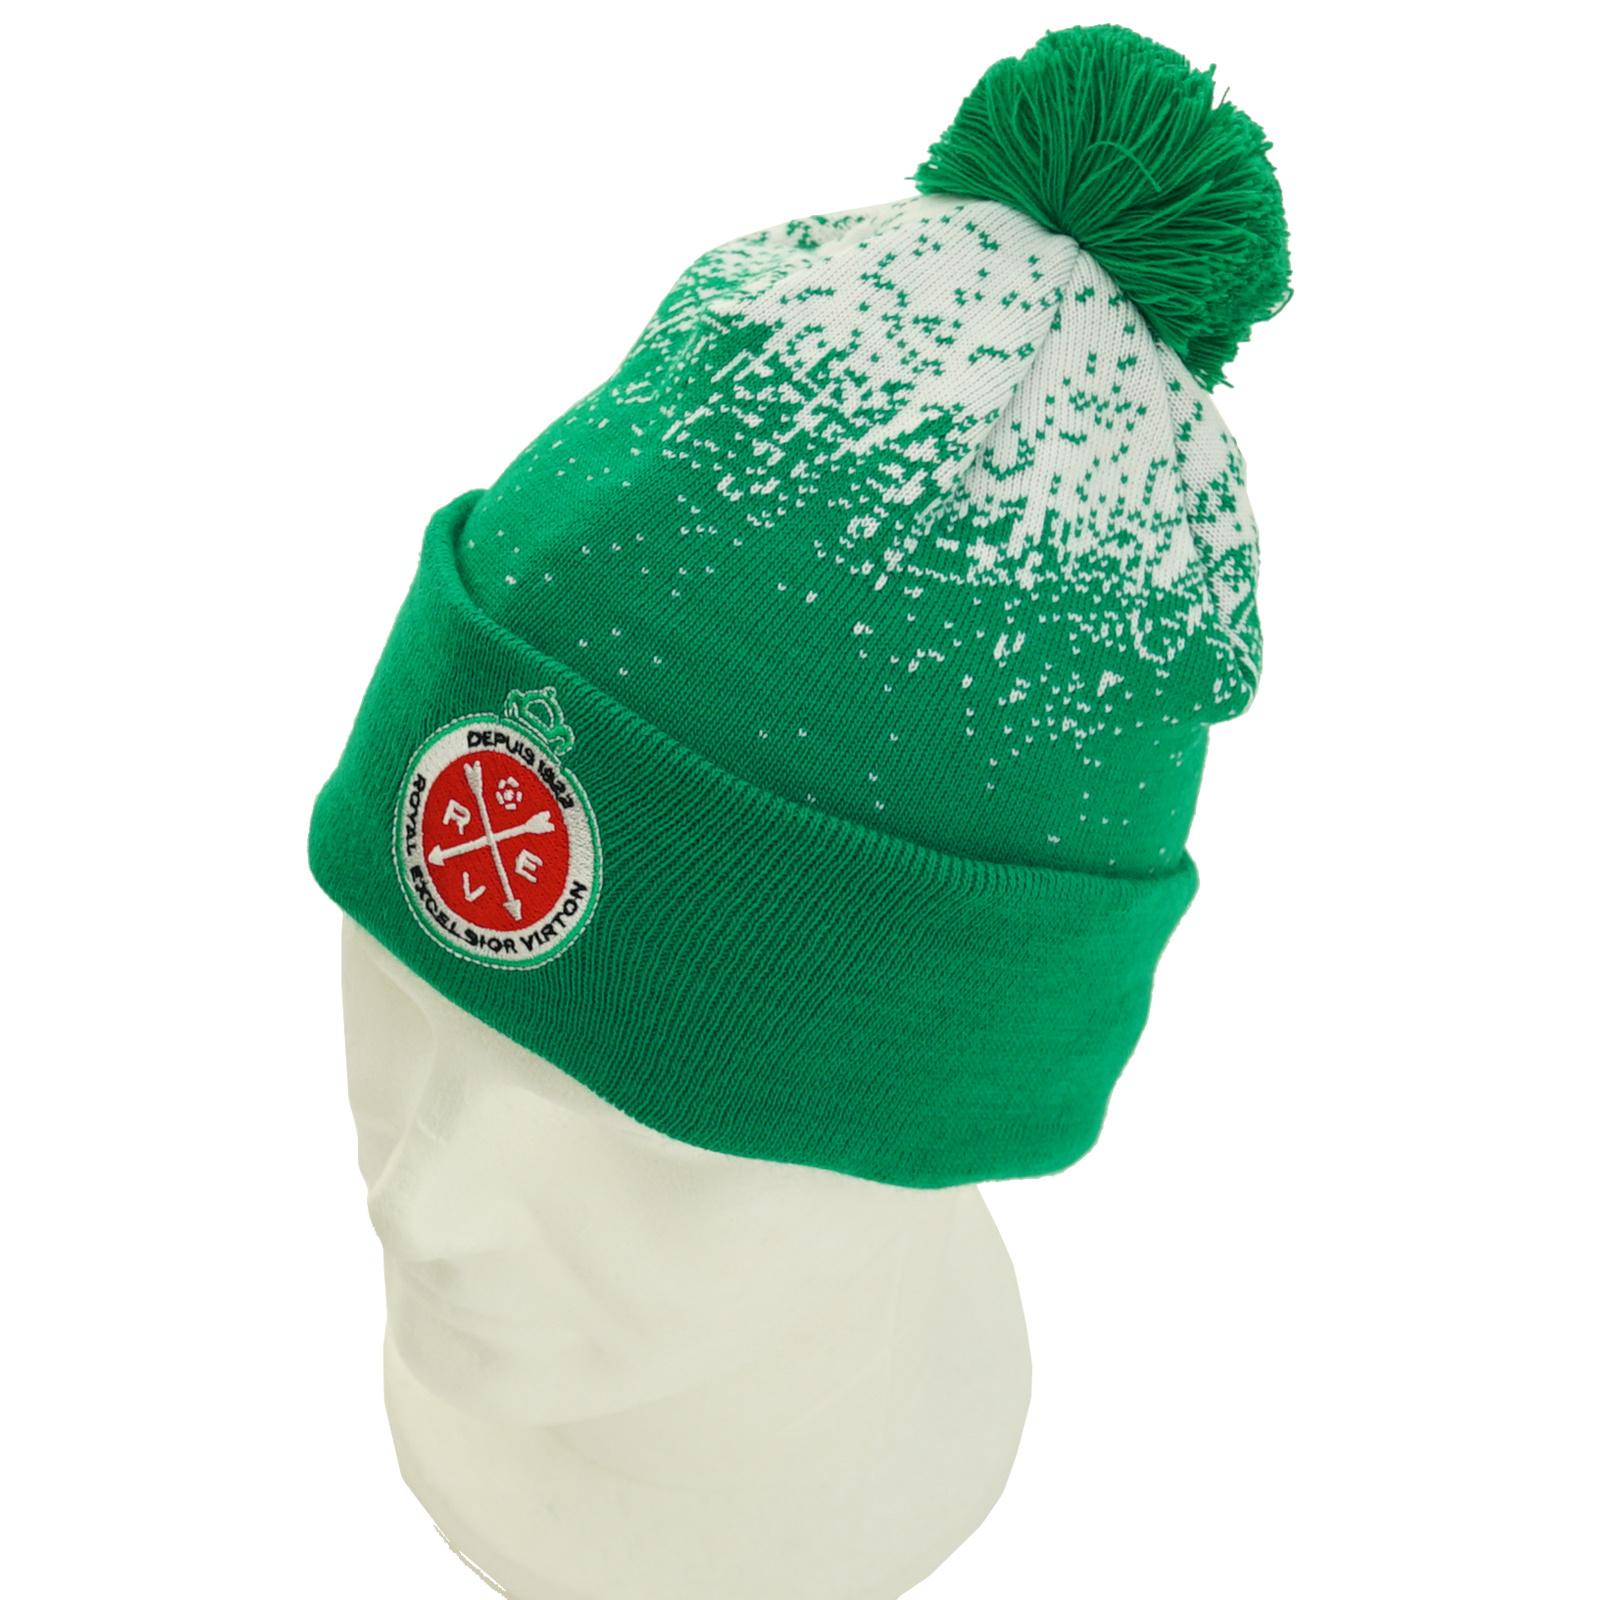 Bonnet hiver vert-blanc